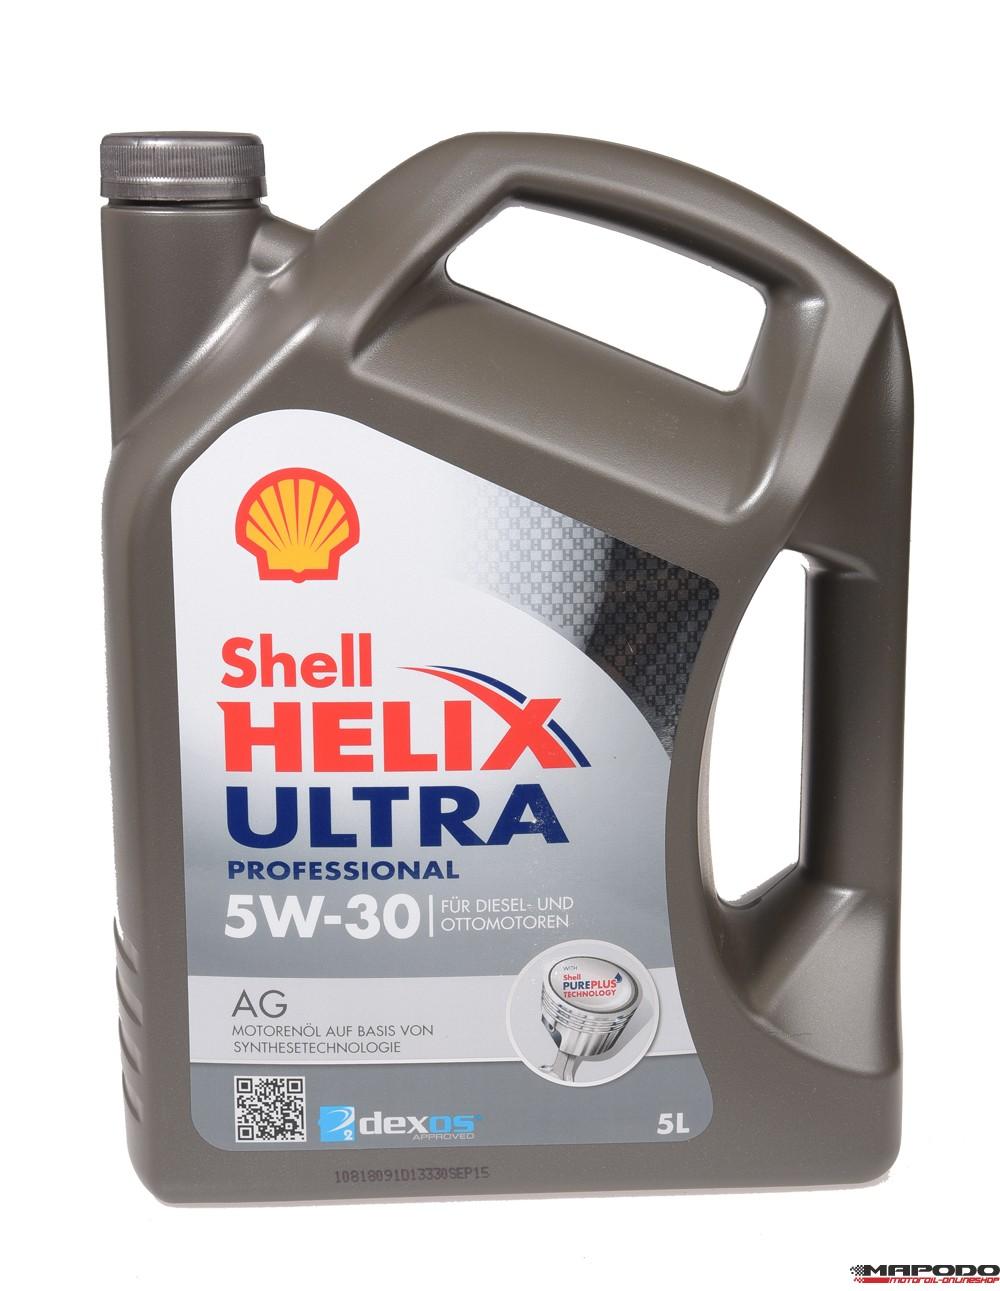 Shell Helix Ultra Professional 5W-30 AG 5L (GM, Dexos 2)